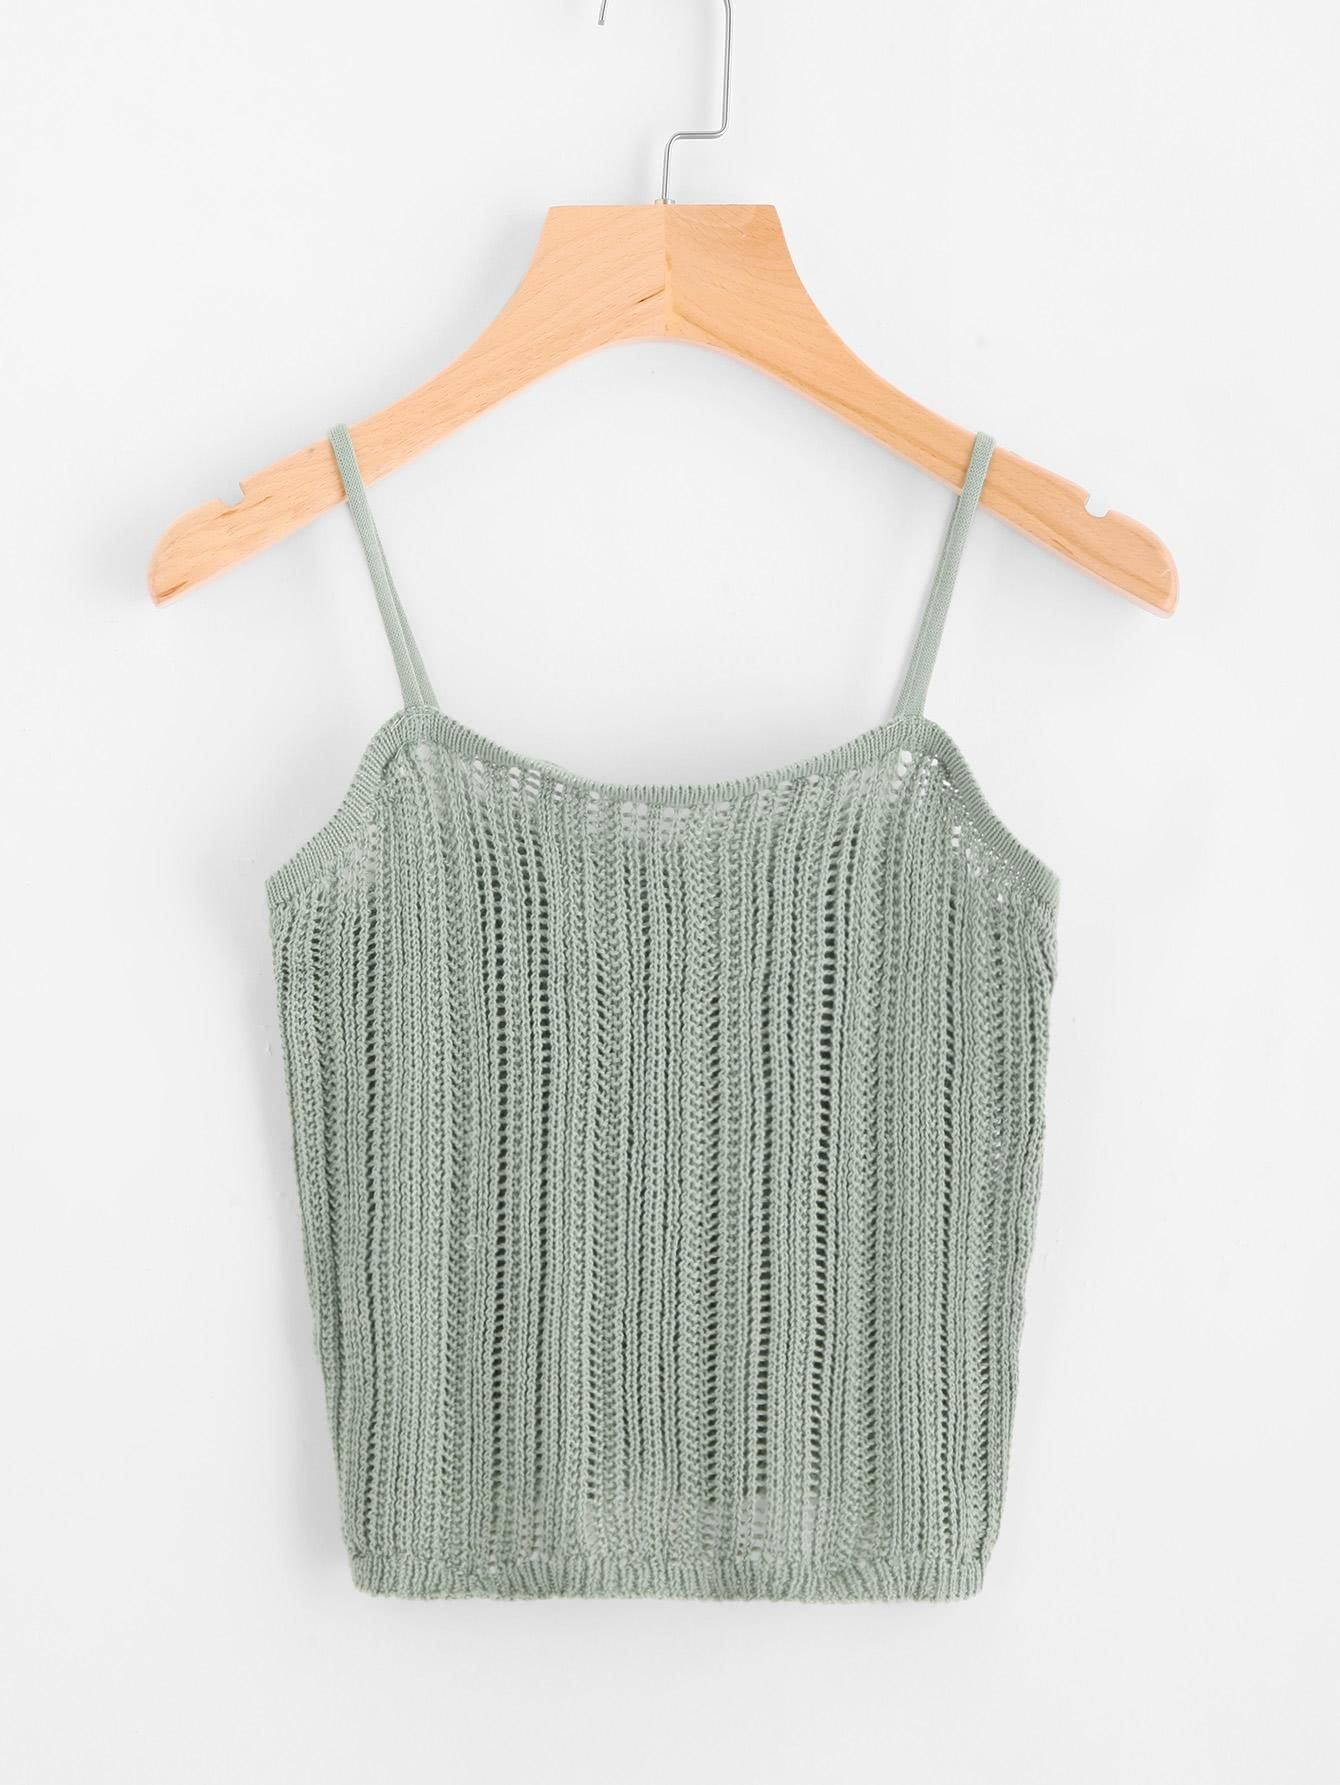 Hollow Out Knit Cami Top en 2018 | tricot | Pinterest